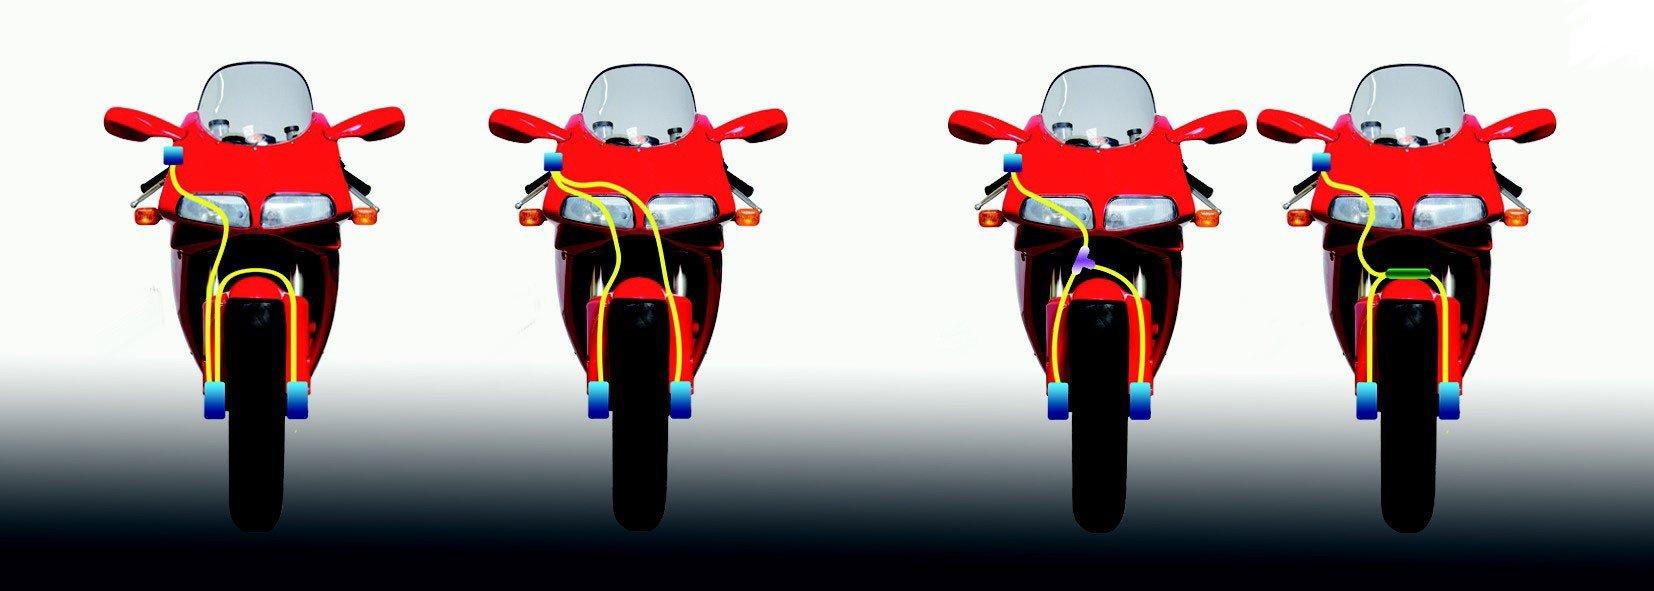 : Montage durite aviation moto - Ezdraulix